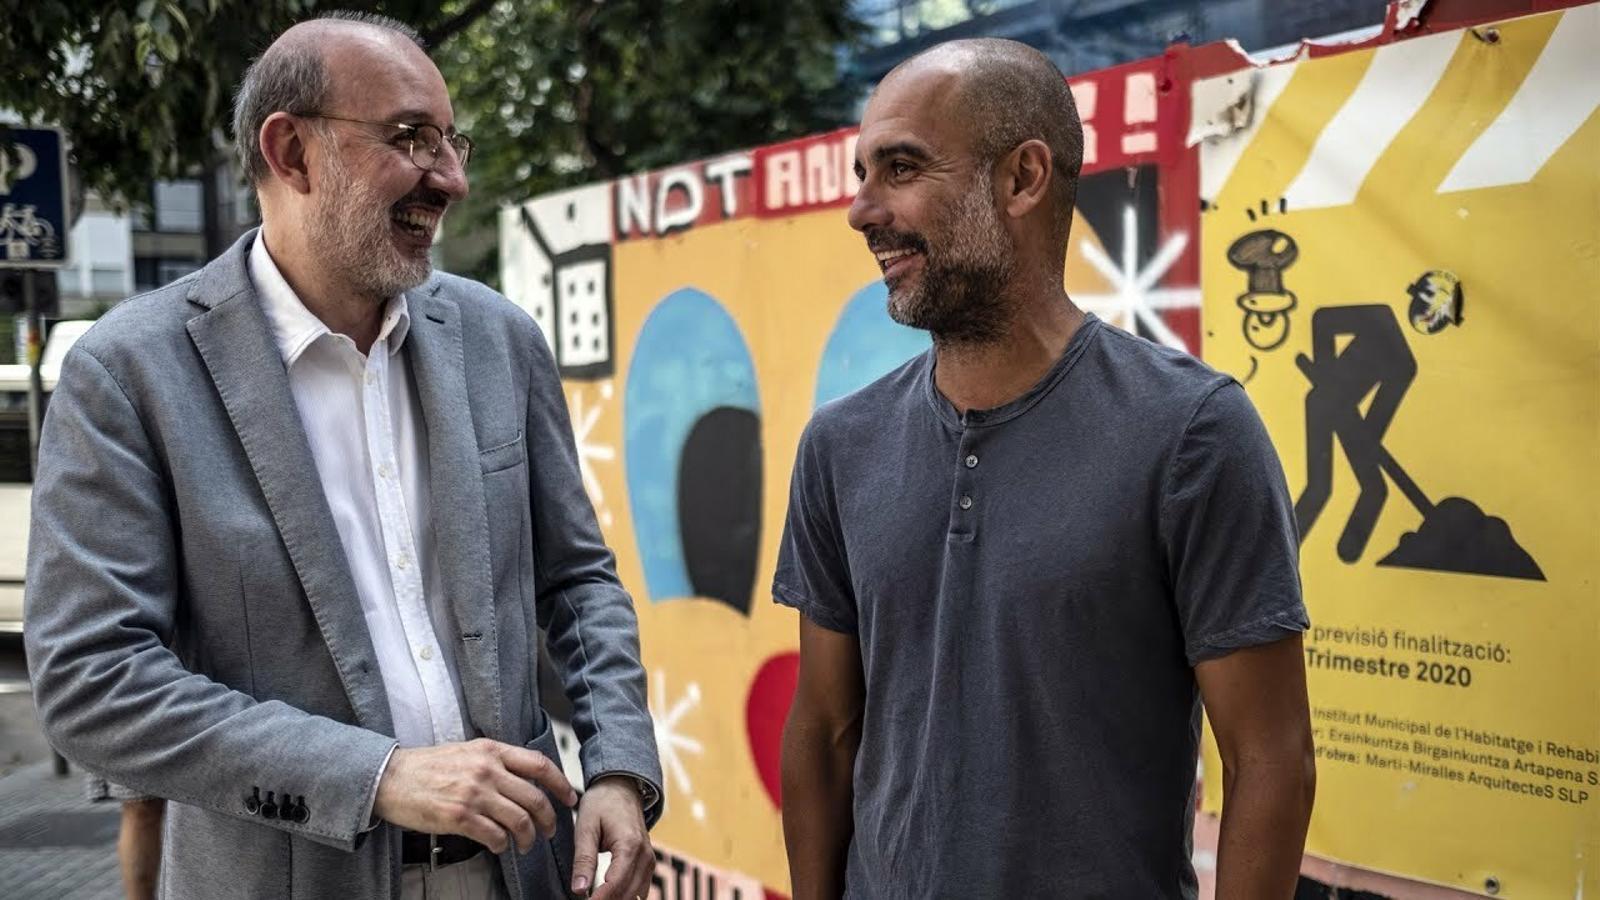 Entrevista d'Antoni Bassas a Pep Guardiola